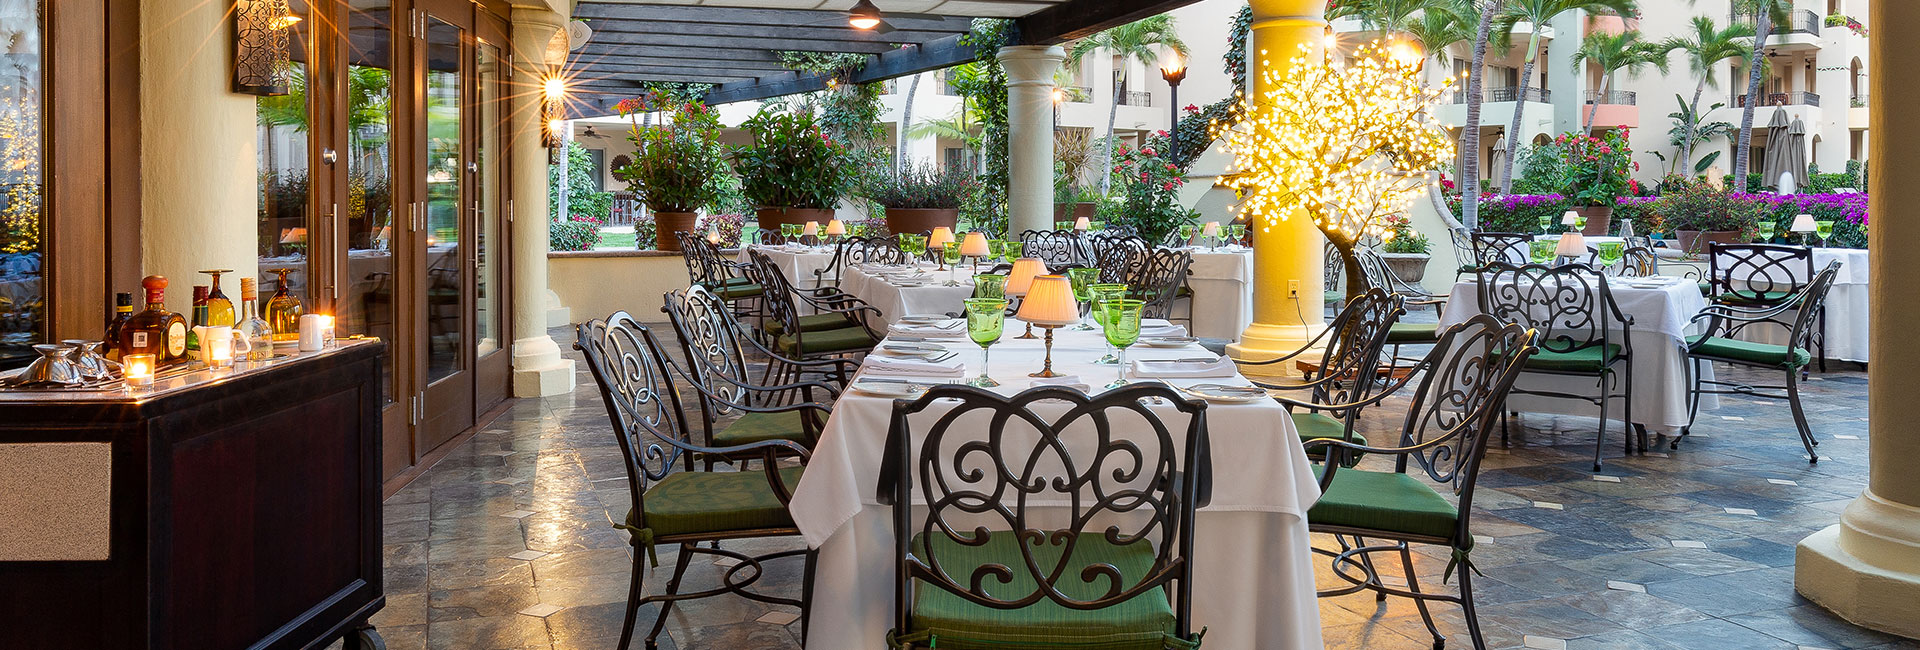 La casona restaurant villa la estancia cabo san lucas